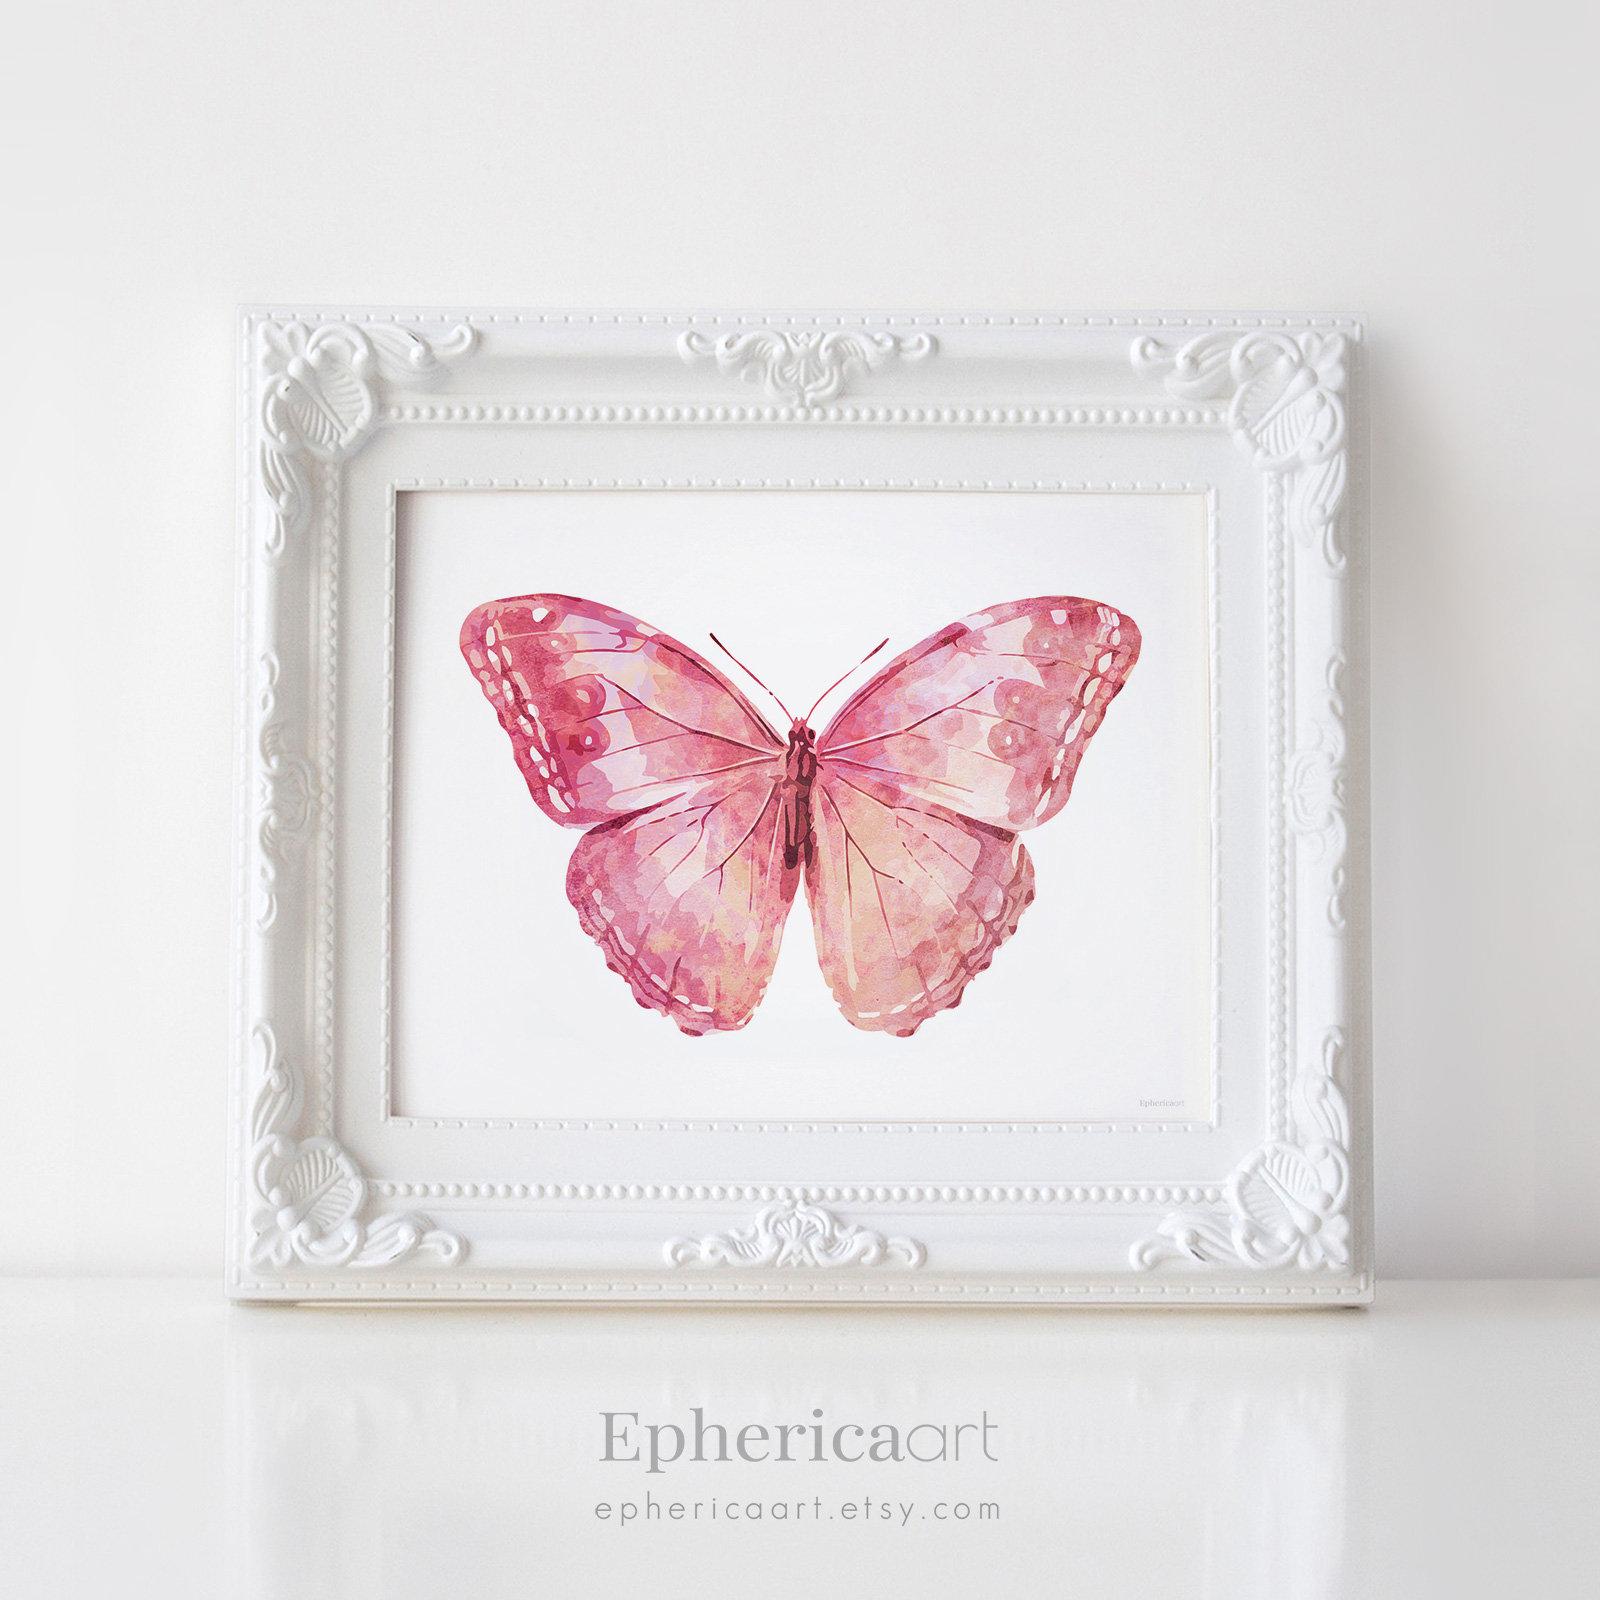 Girly Pink Nursery Decor: Pink Butterfly Art Print Girly Wall Art Bedroom Decor